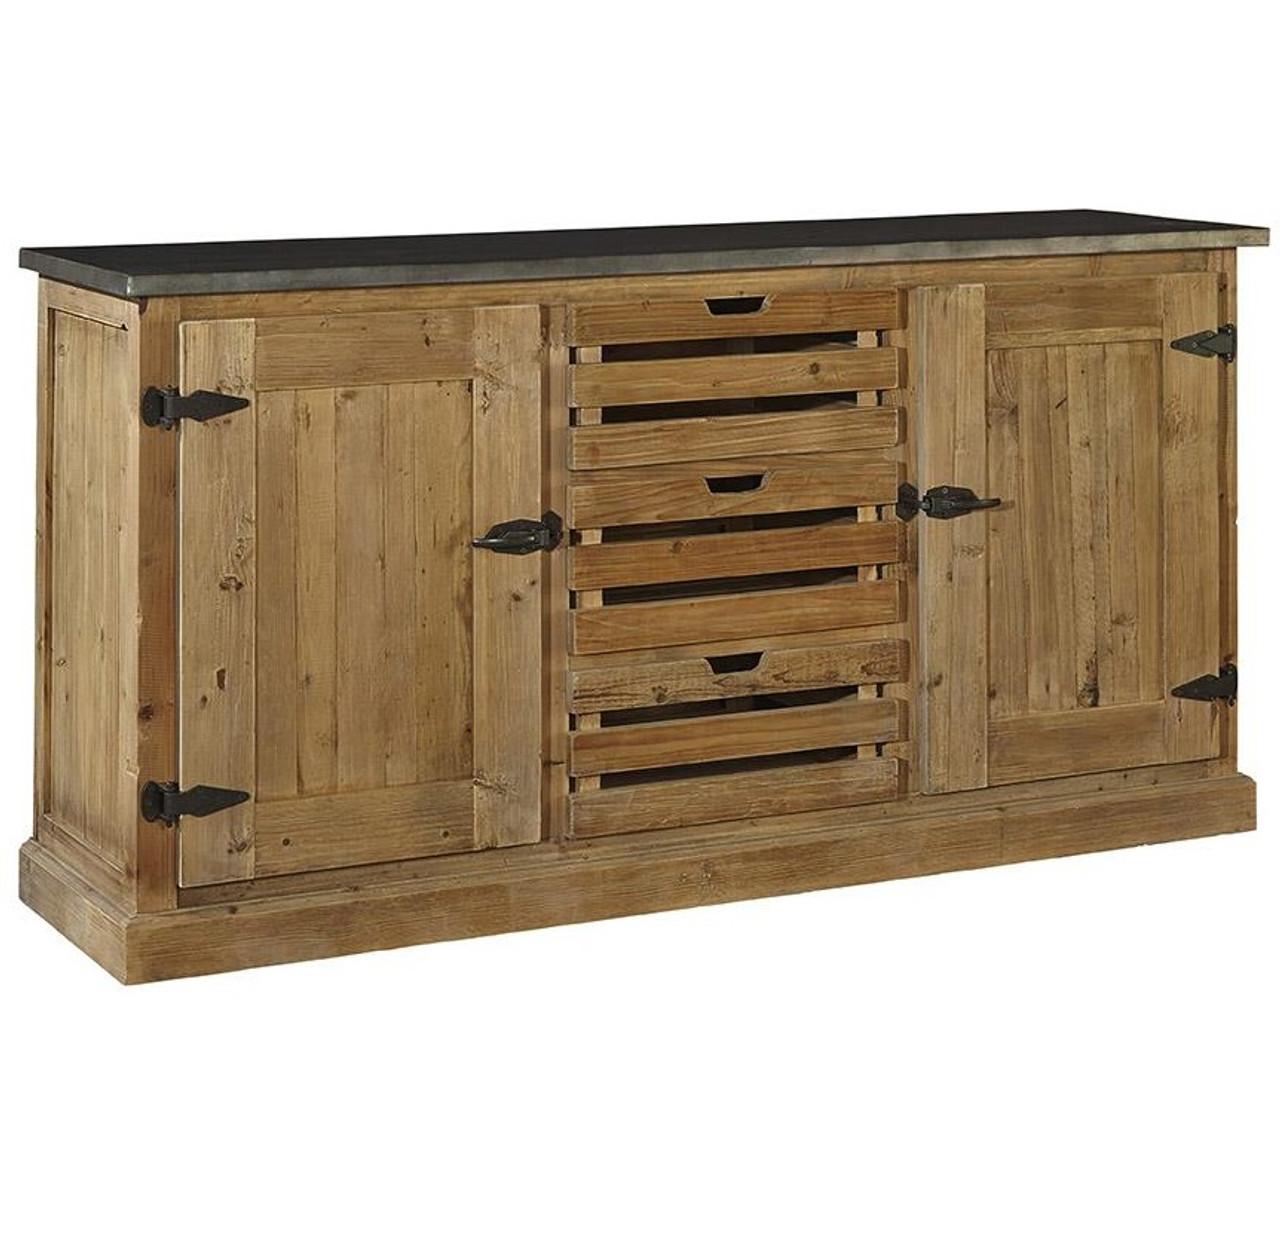 Farmhouse Zinc Top Reclaimed Wood Buffet Sideboard - Farmhouse Zinc Top Reclaimed Wood Buffet Sideboard Zin Home